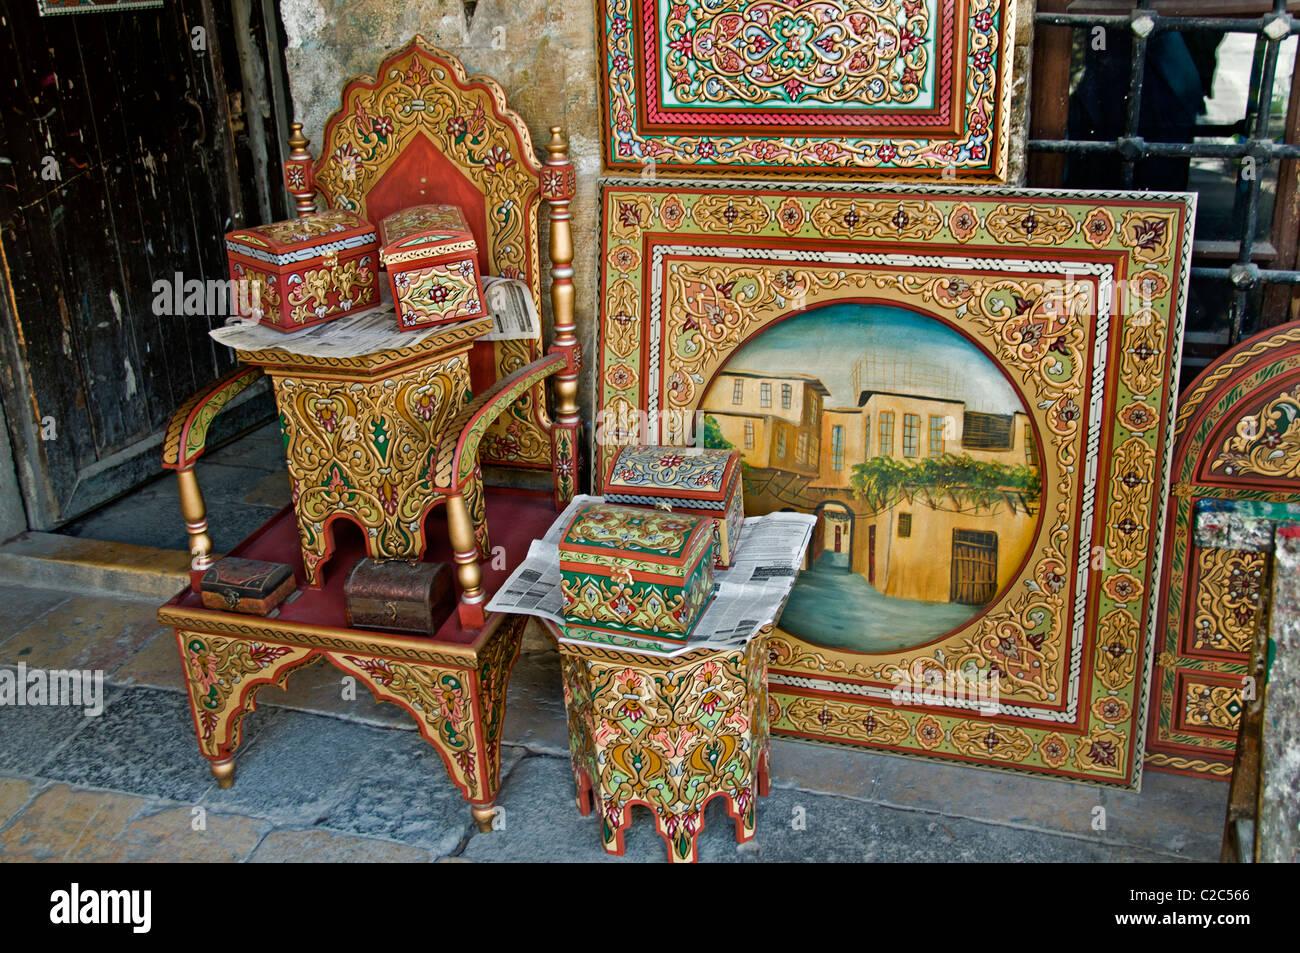 Damaskus Möbel Malen Maler Malen Syrien Basar Souk Souk Markt Shopp